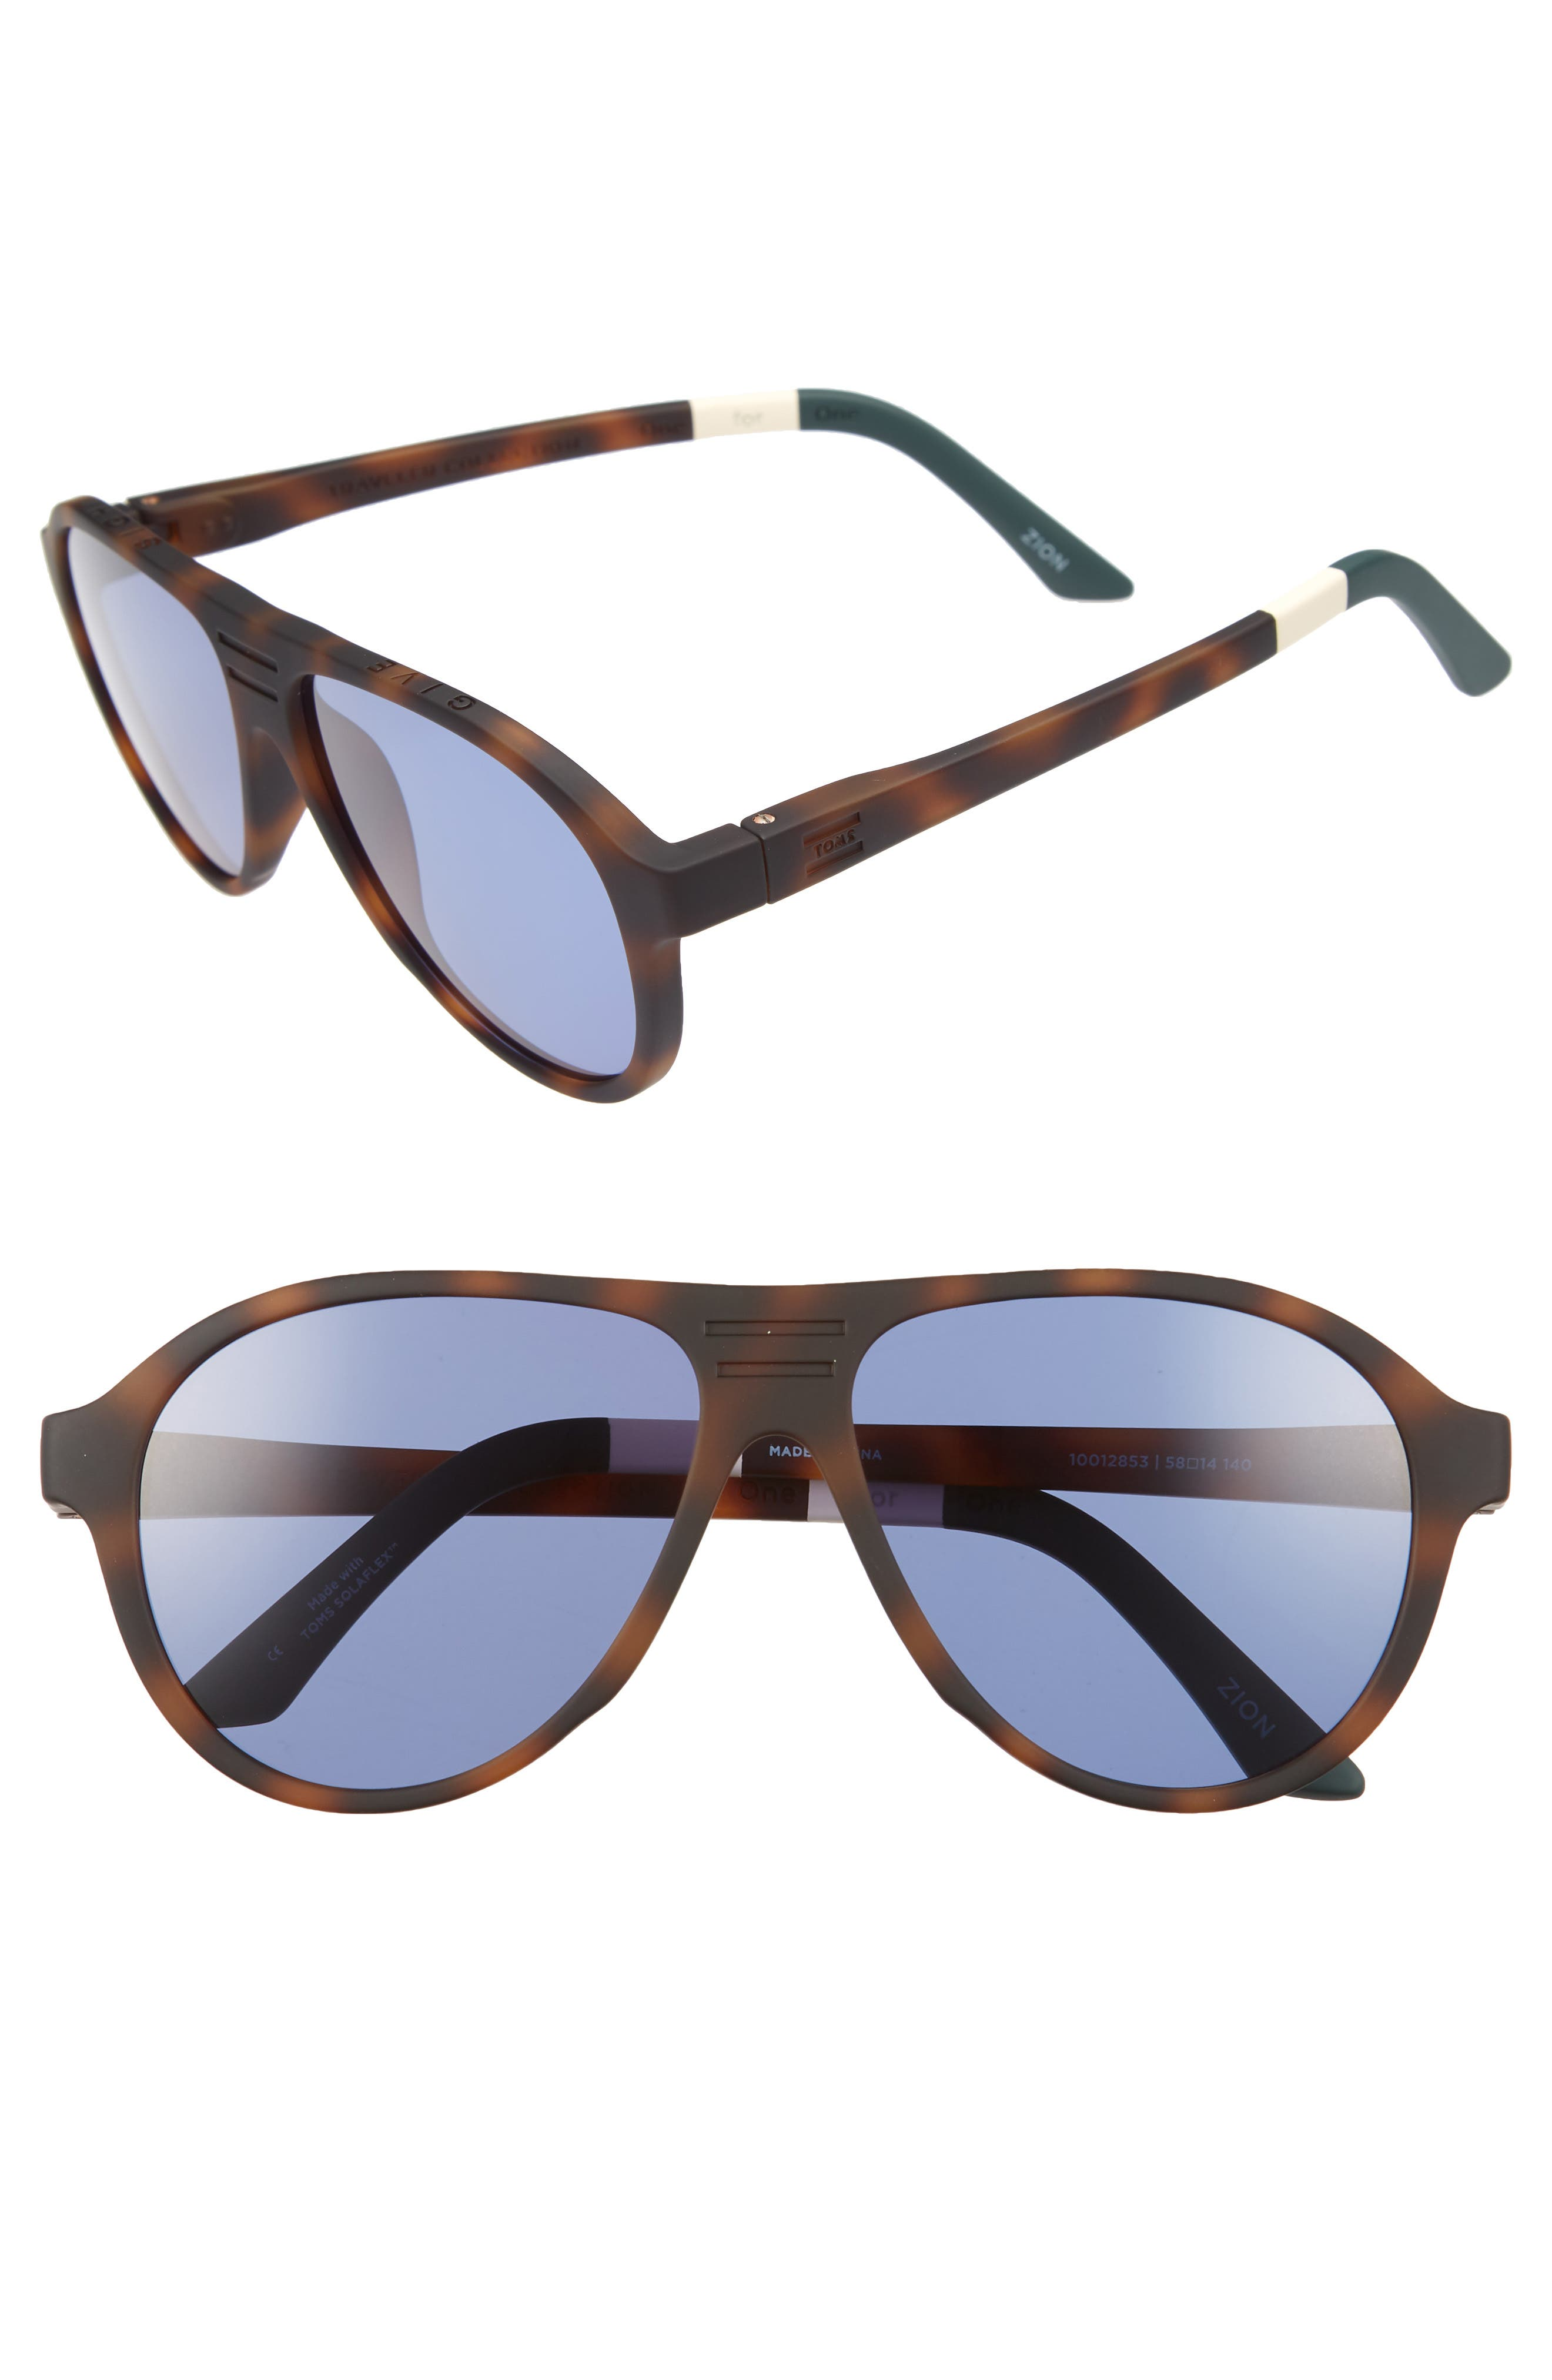 Traveler Zion 58mm Aviator Sunglasses,                         Main,                         color, MATTE DARK TORTOISE/ INDIGO